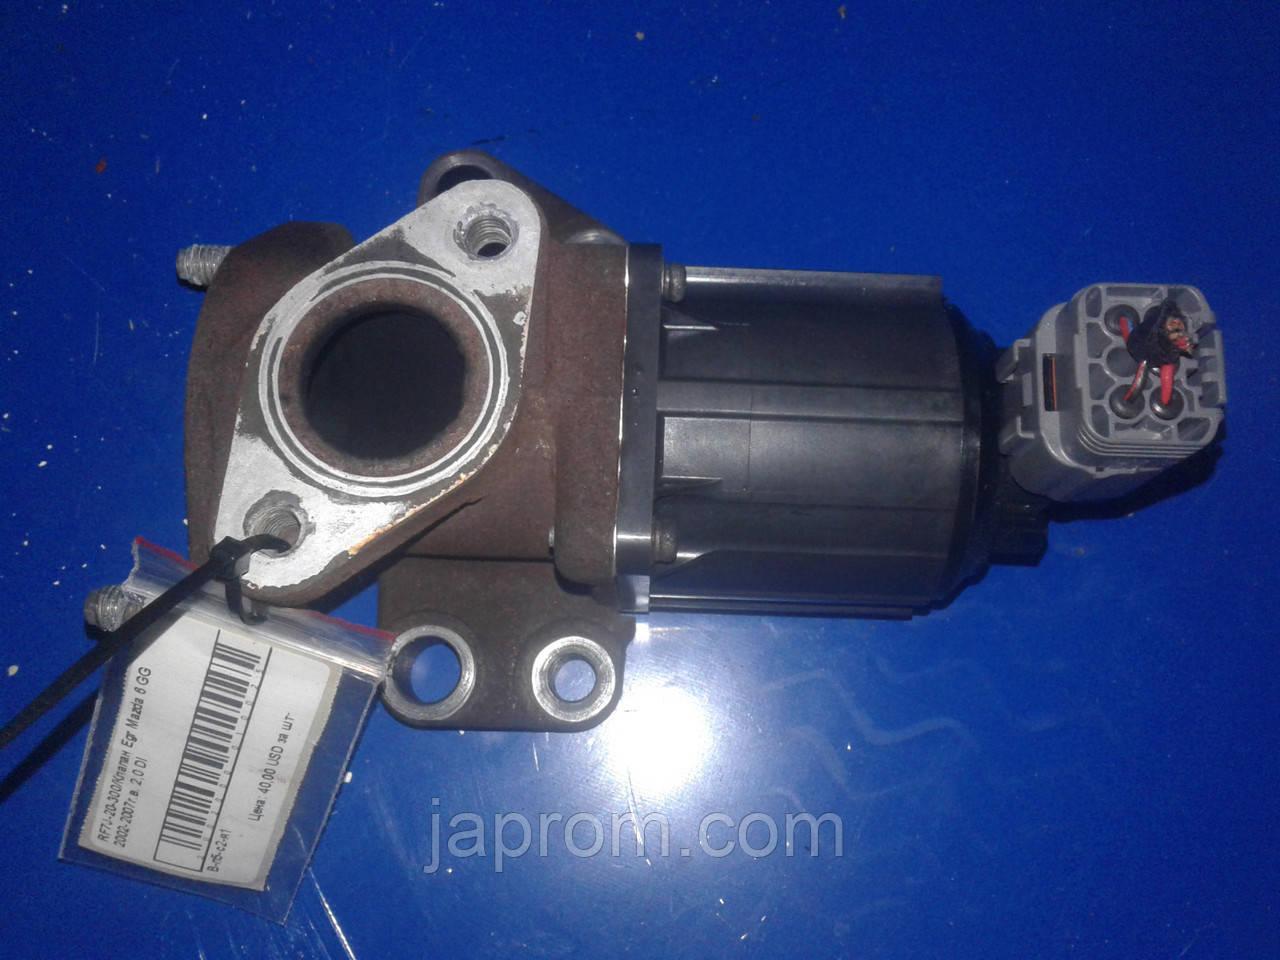 Клапан Egr Mazda 6 GG 2002-2007г.в. 2,0 DI .